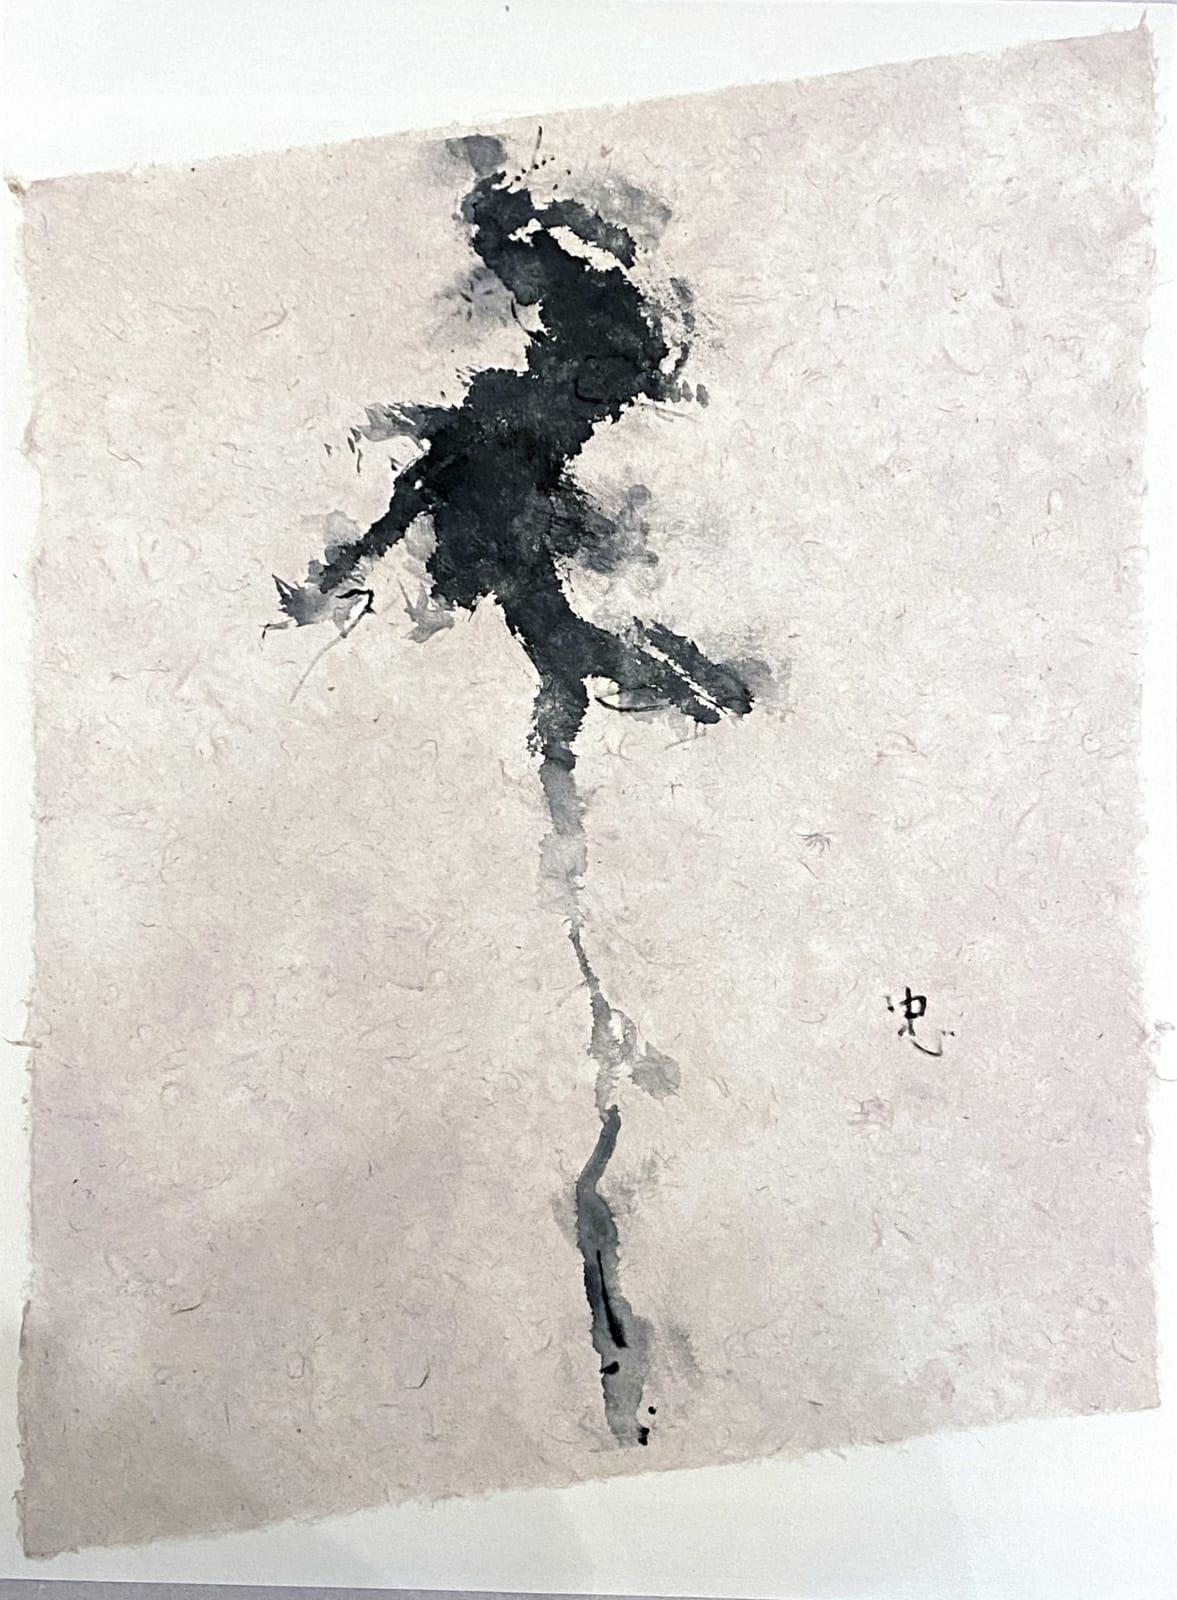 Tadataka Kishino, Single Pine Tree